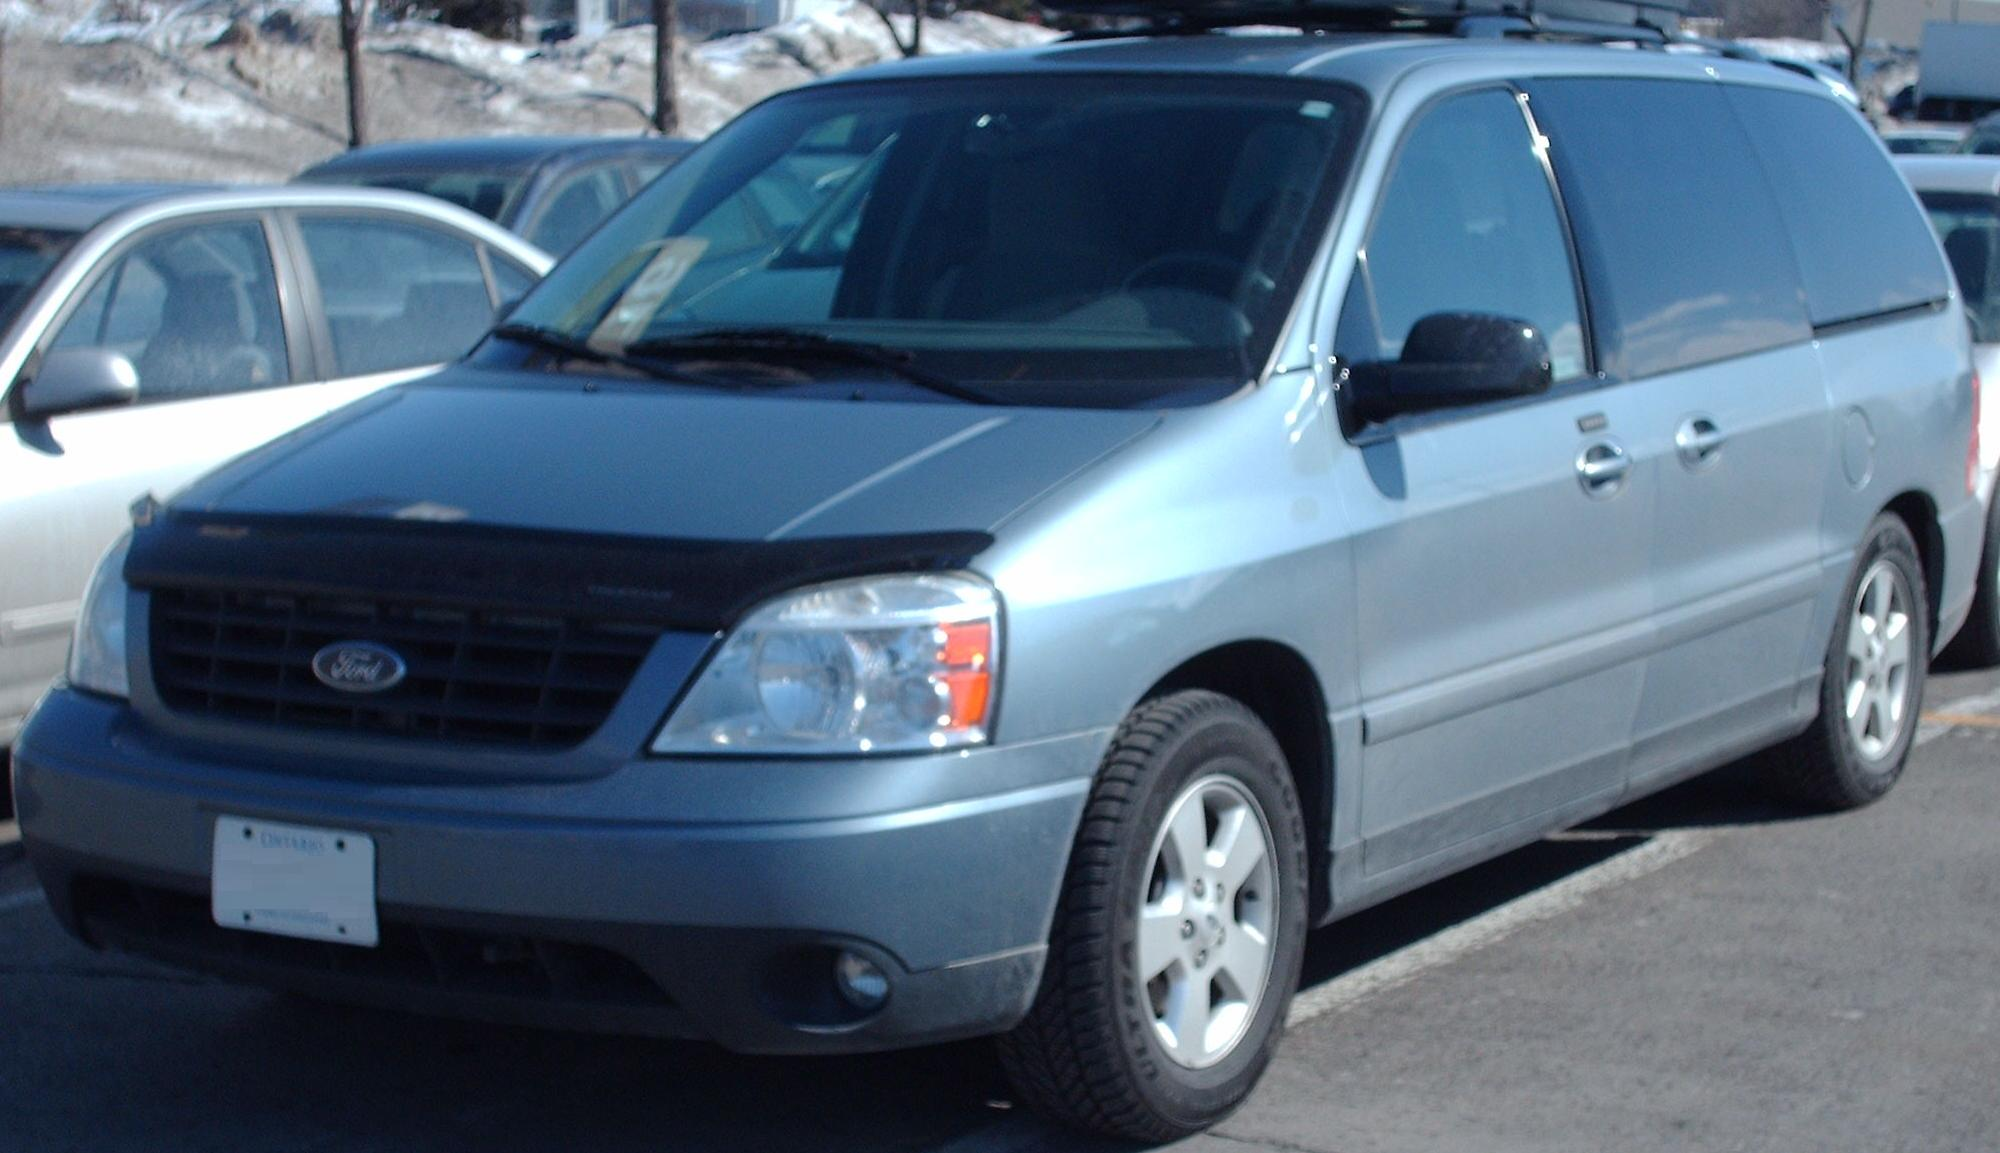 2004 ford freestar image 2